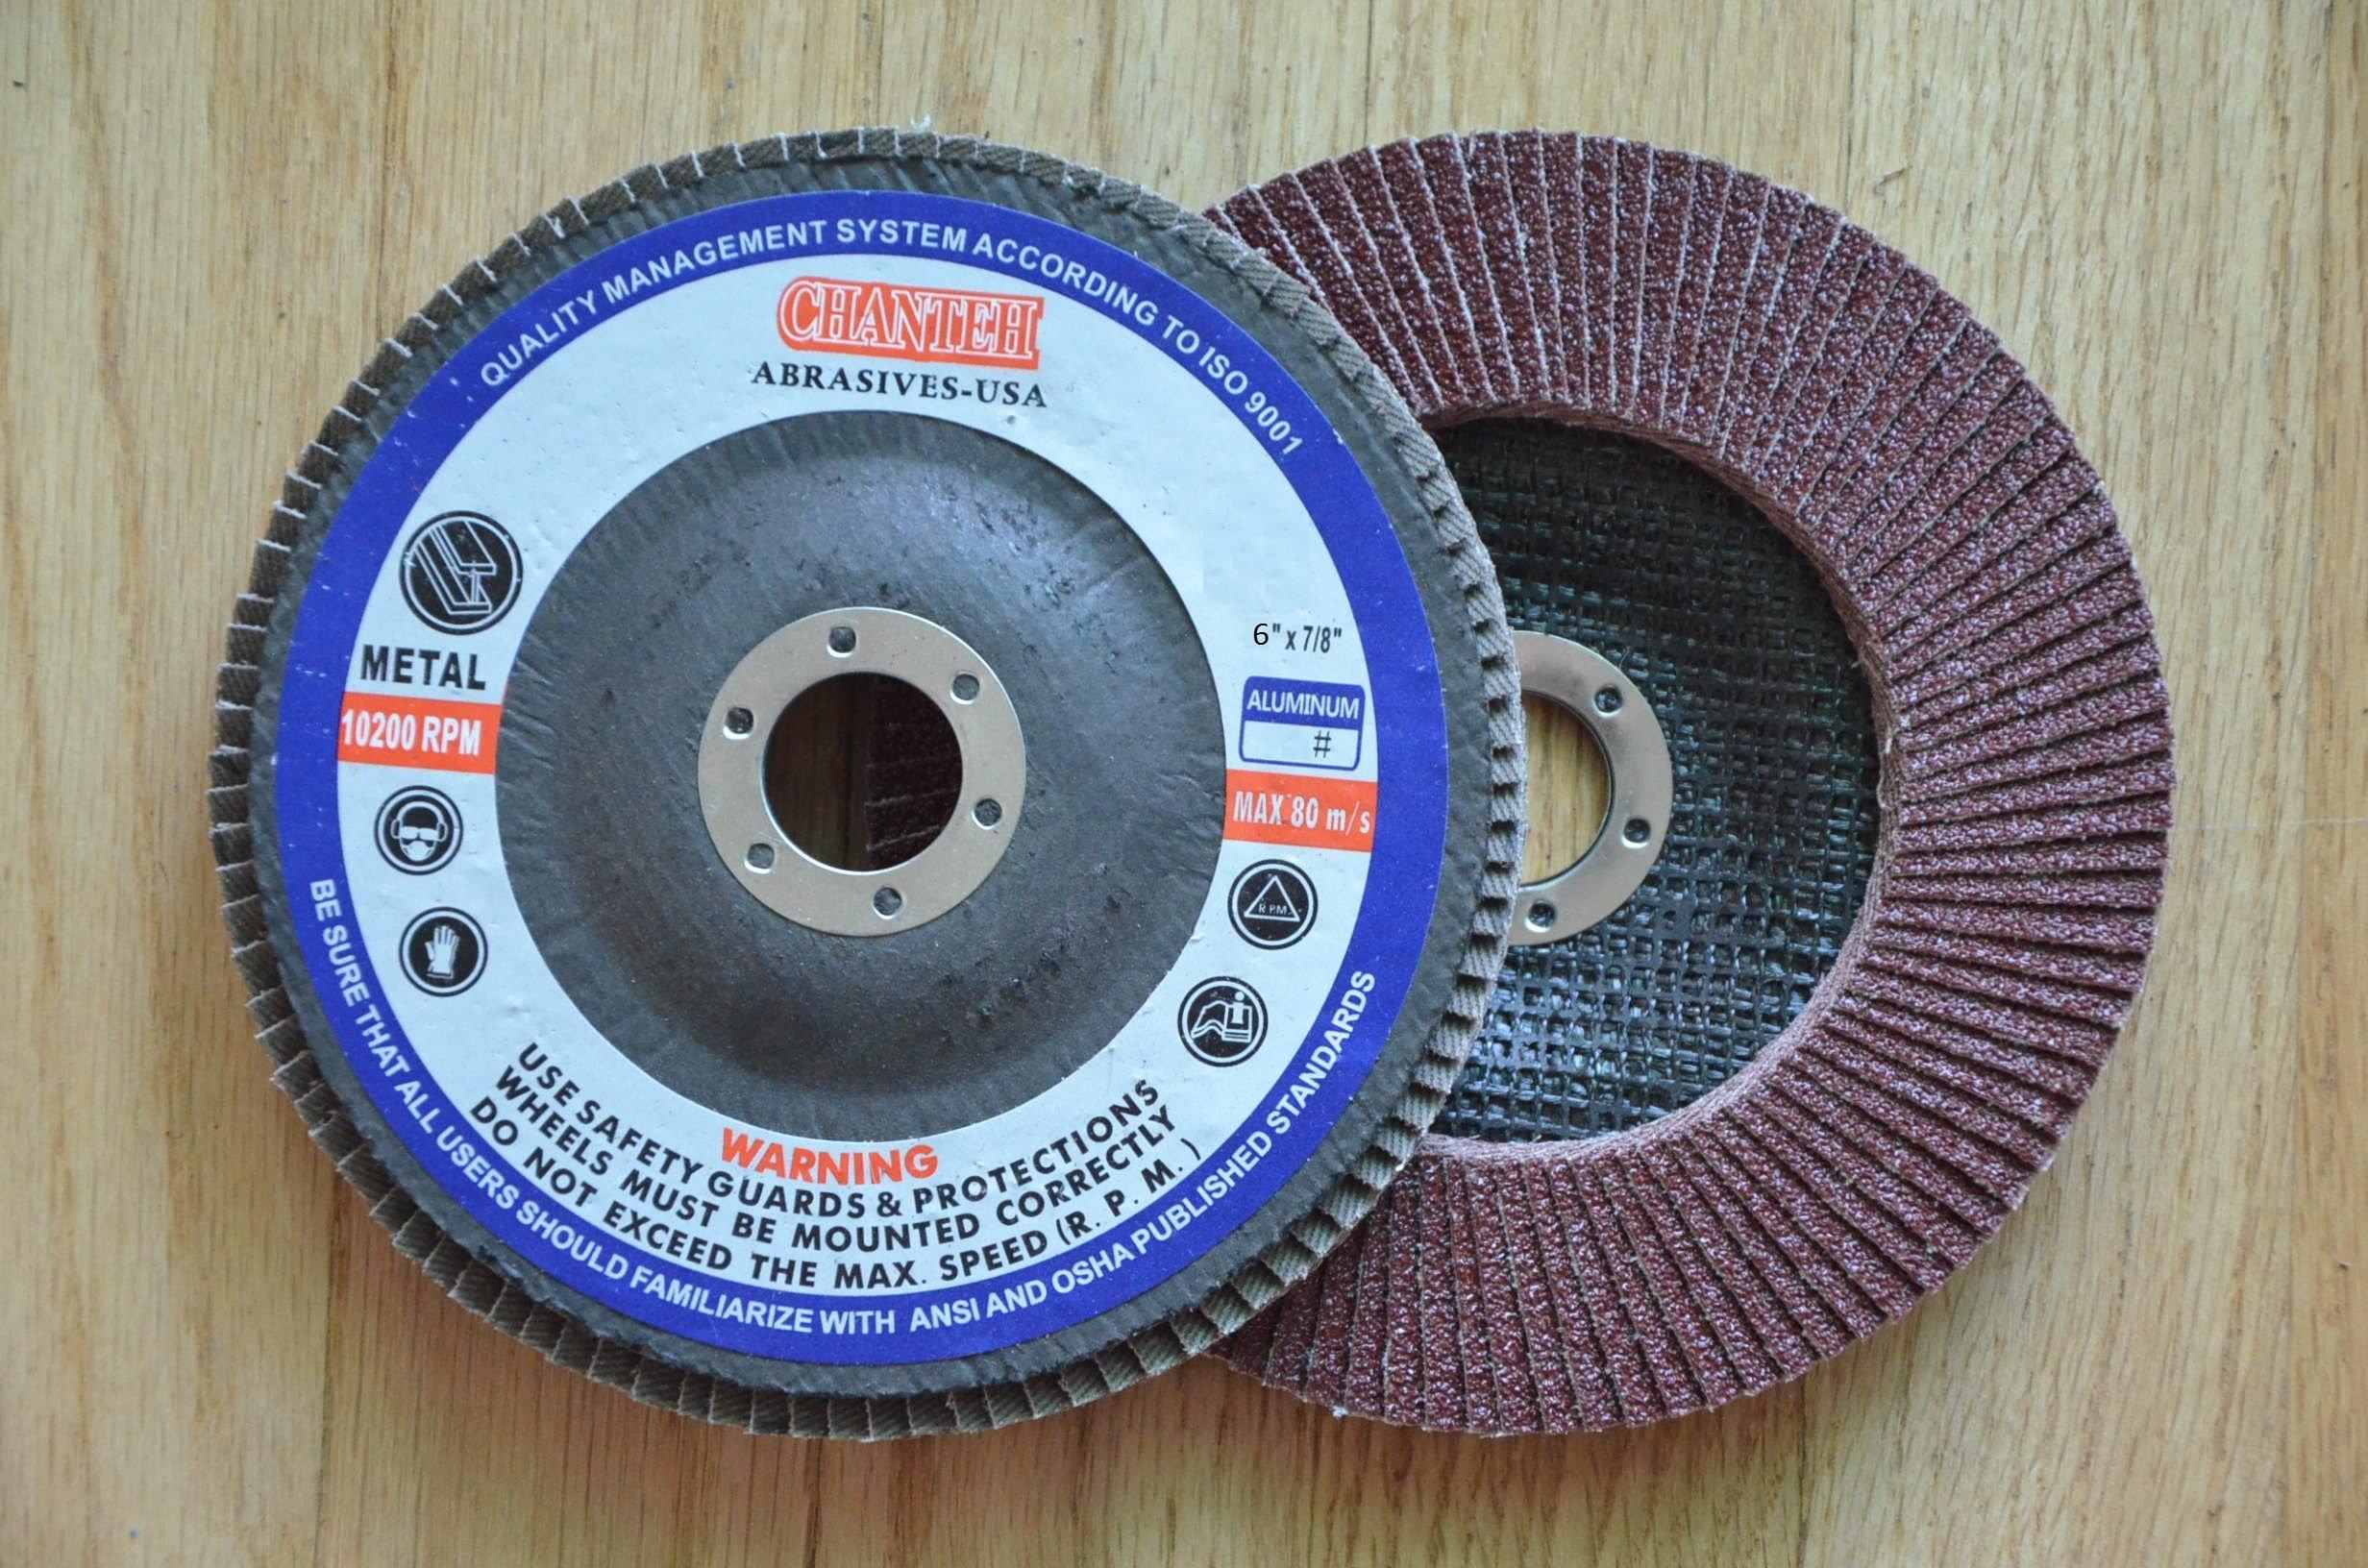 Premium FLAP DISCS 6'' x 7/8'' Aluminum Oxide 40 grit Grinding Wheel for angle grinder - 10pcs Pack by CHANTEH